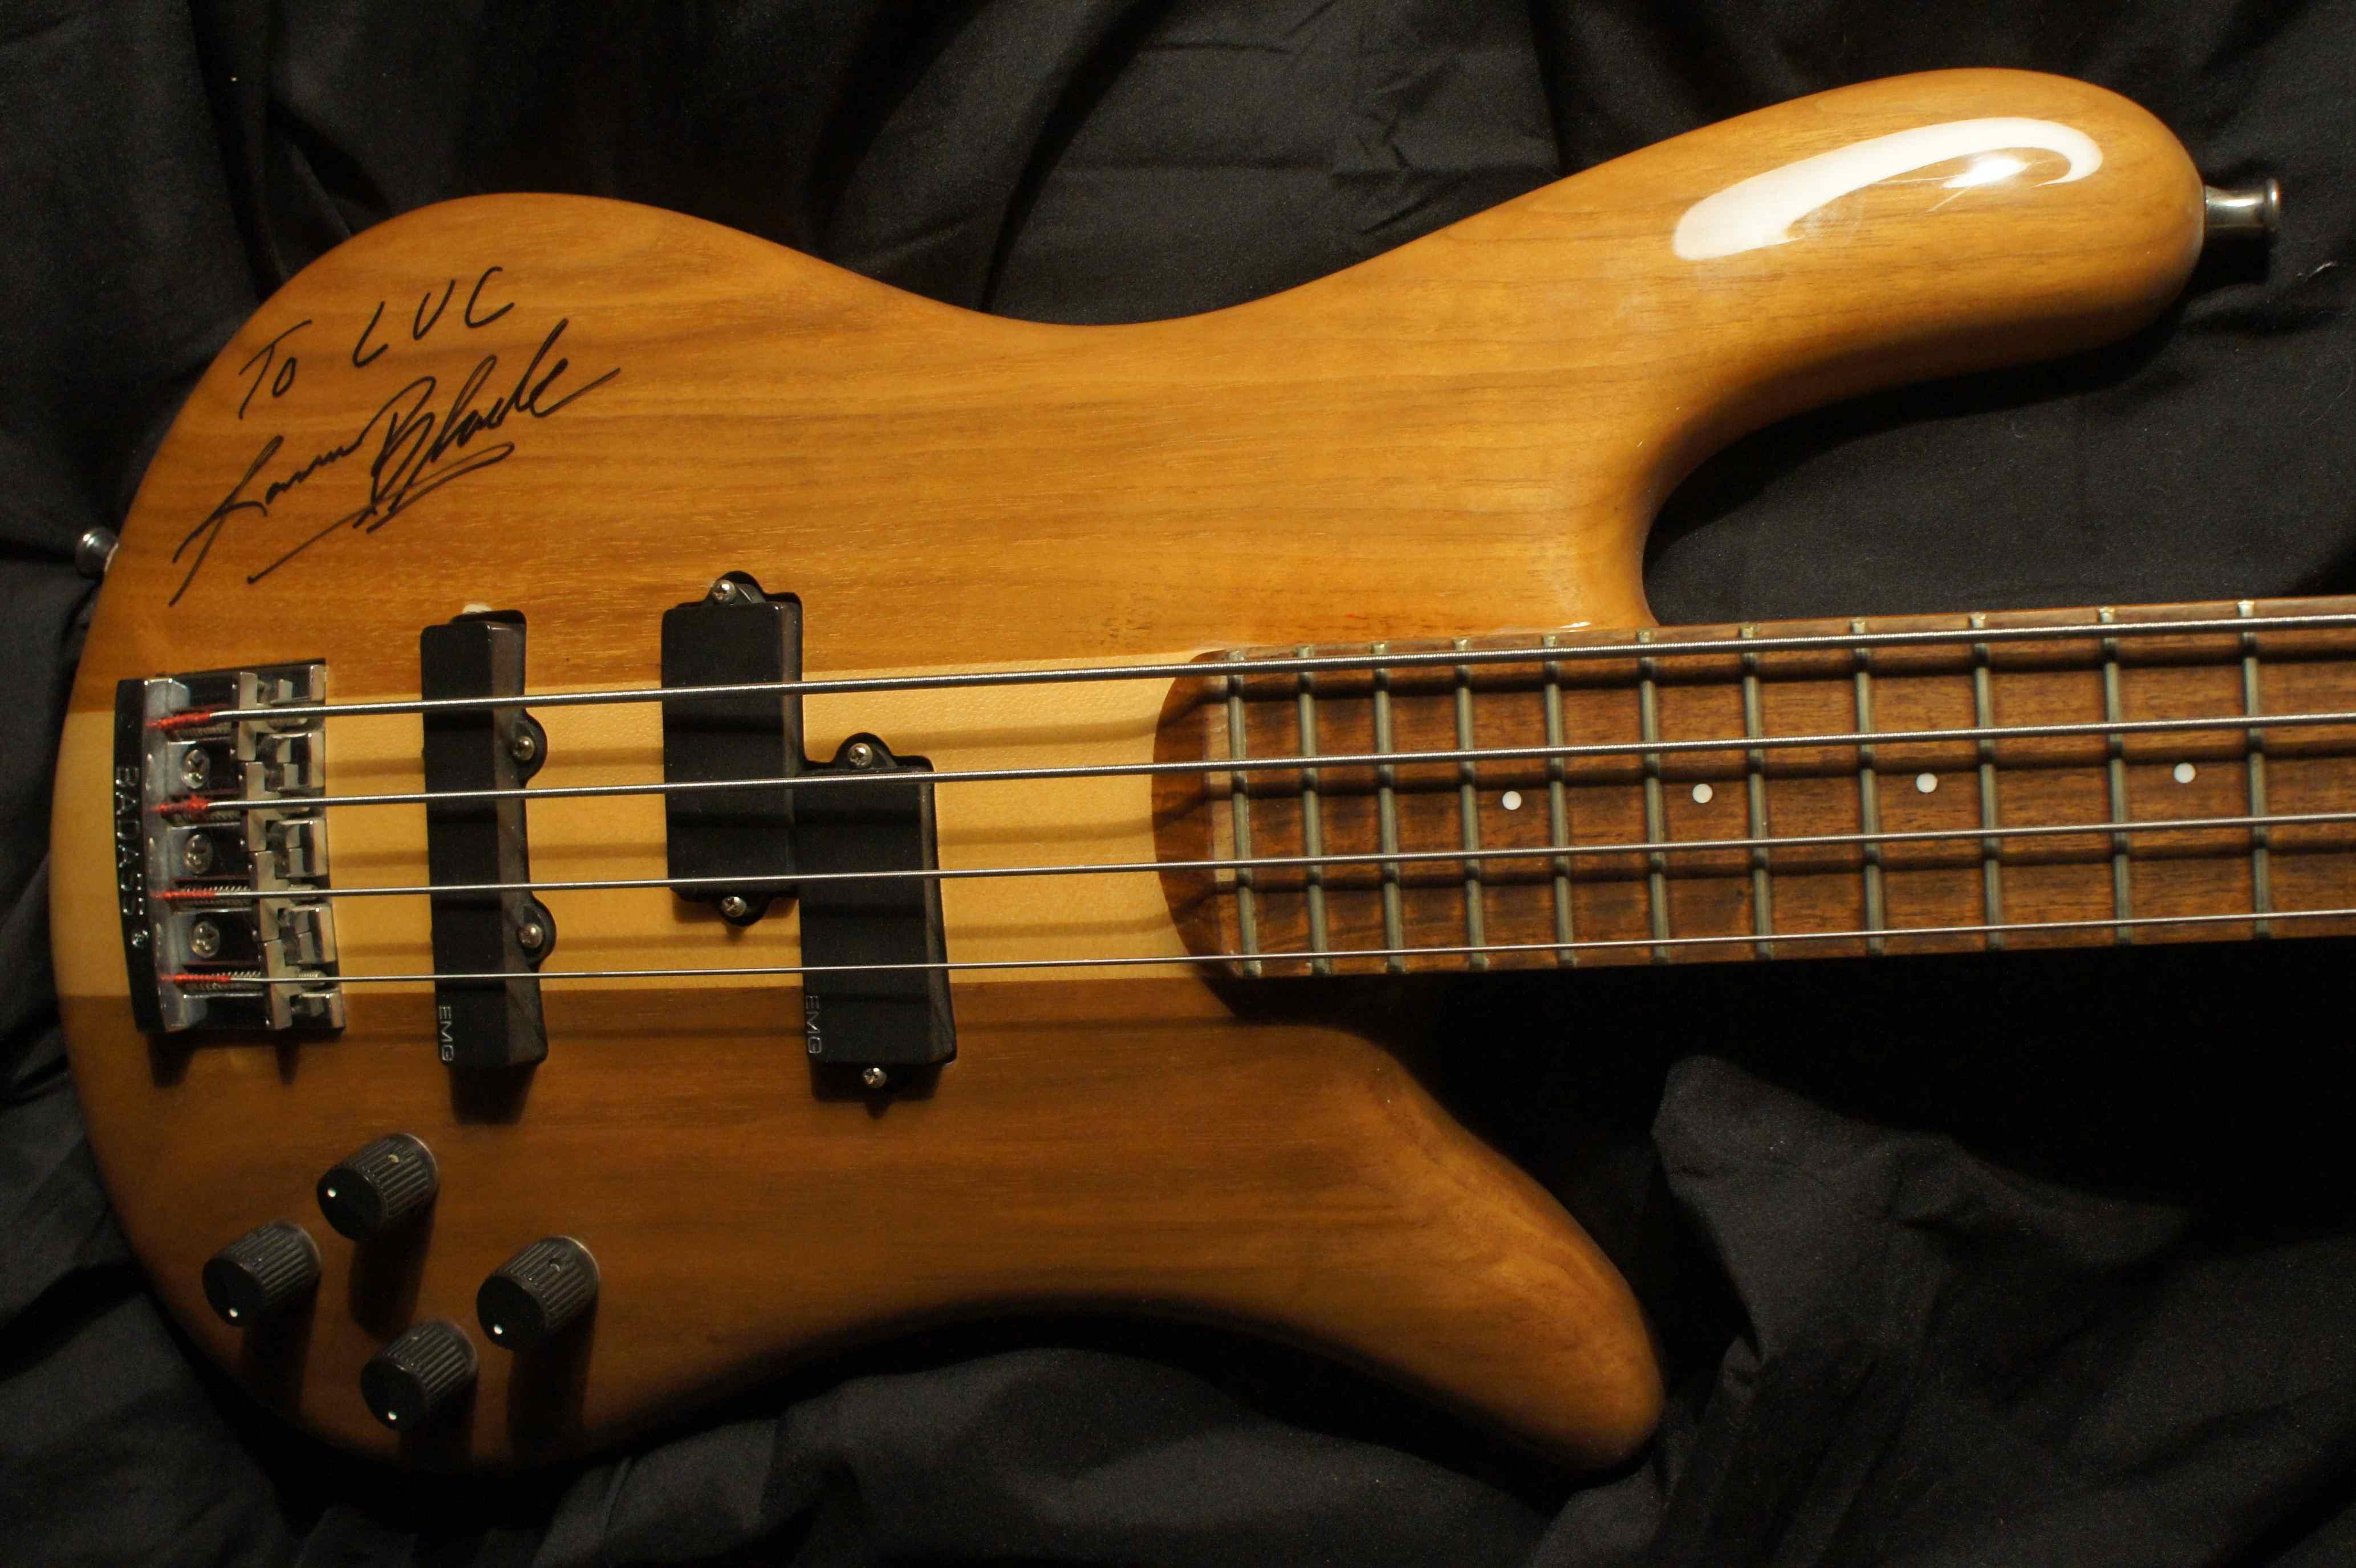 Spector Ns 2 Bass 1984 Lorne Black Great White